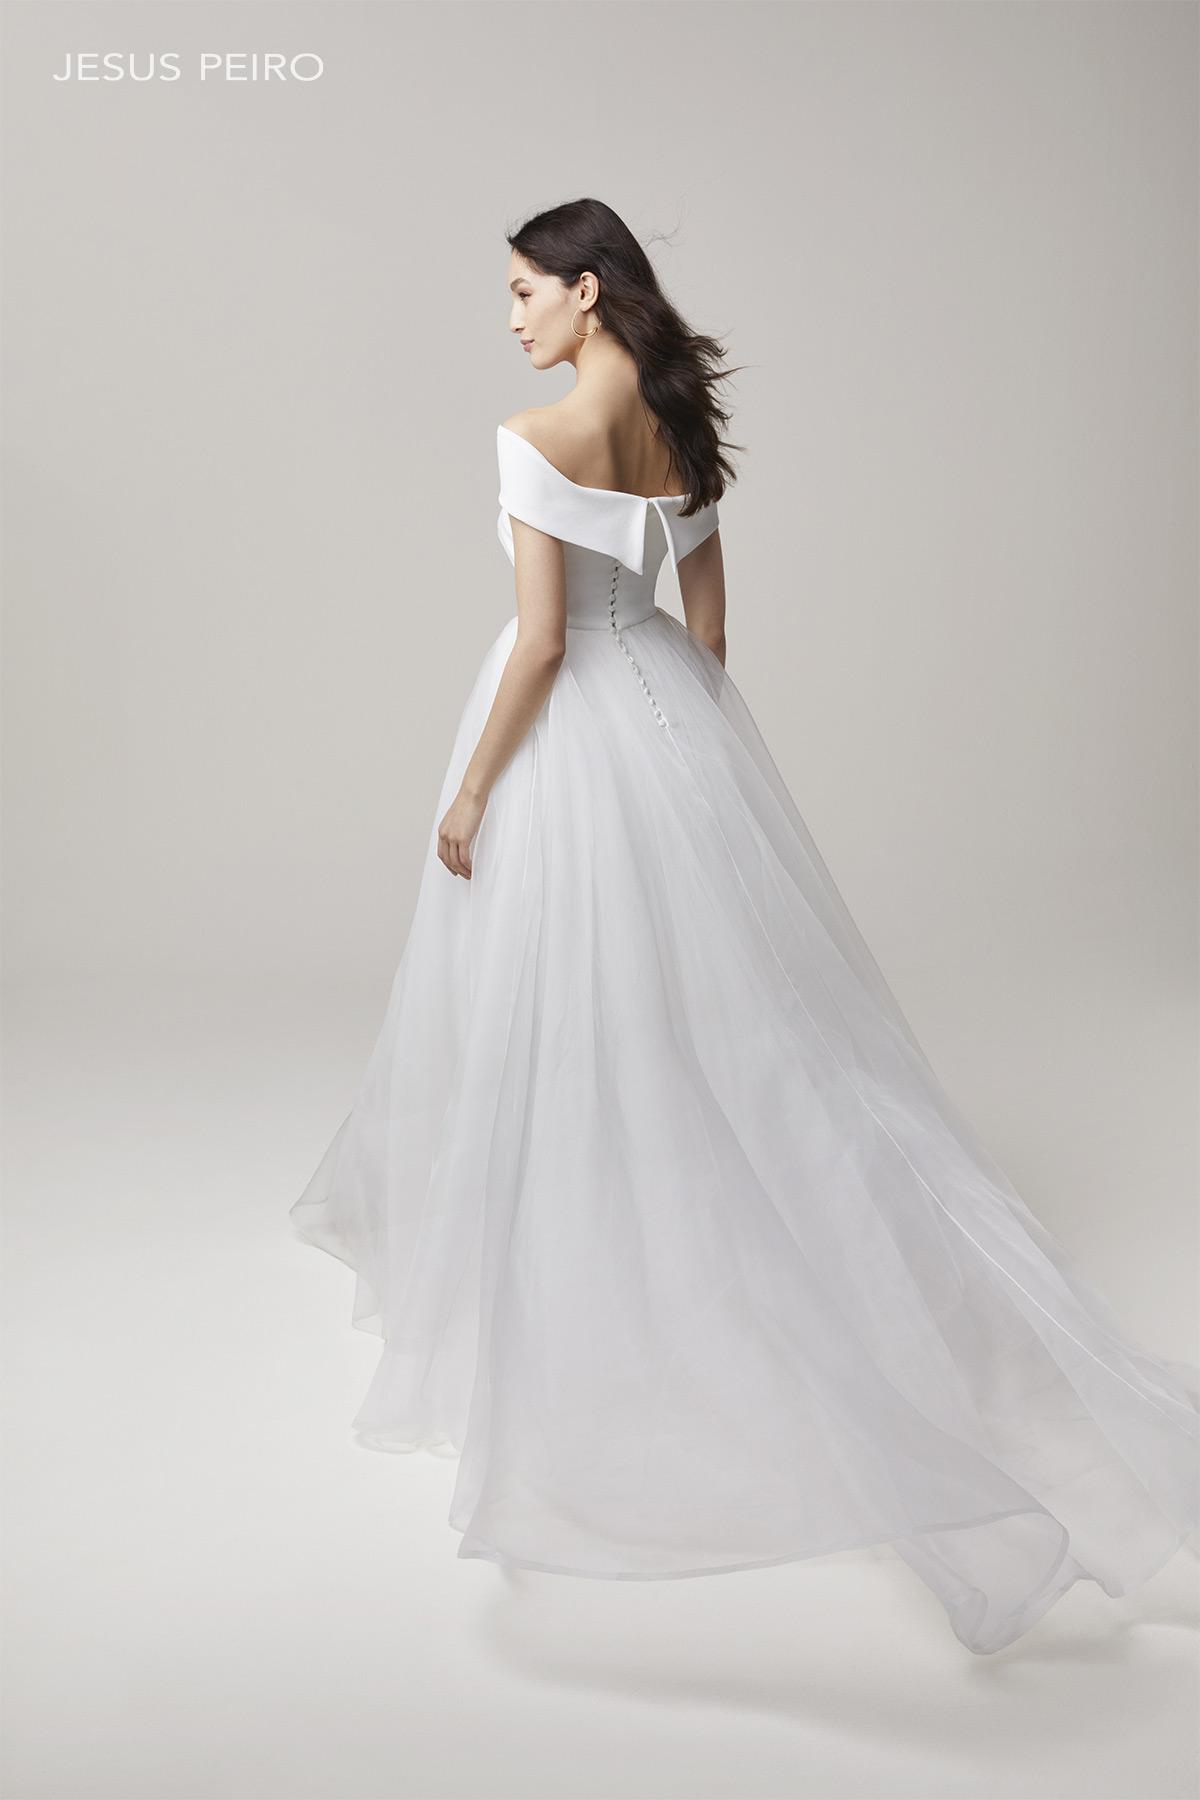 Vestido novia Jesús Peiró Ref.2204